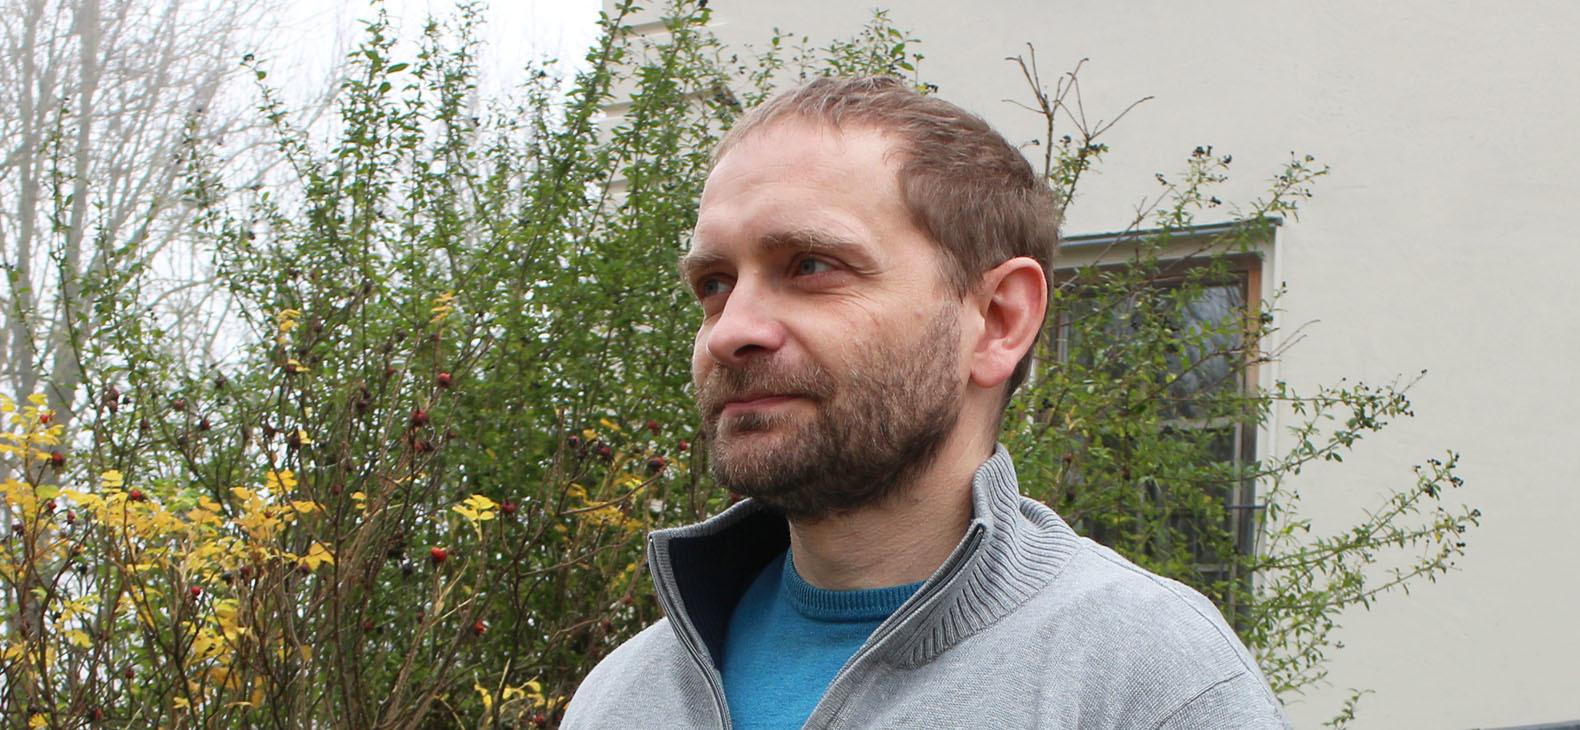 Transfer Budapest: Adam Szabo Portrai